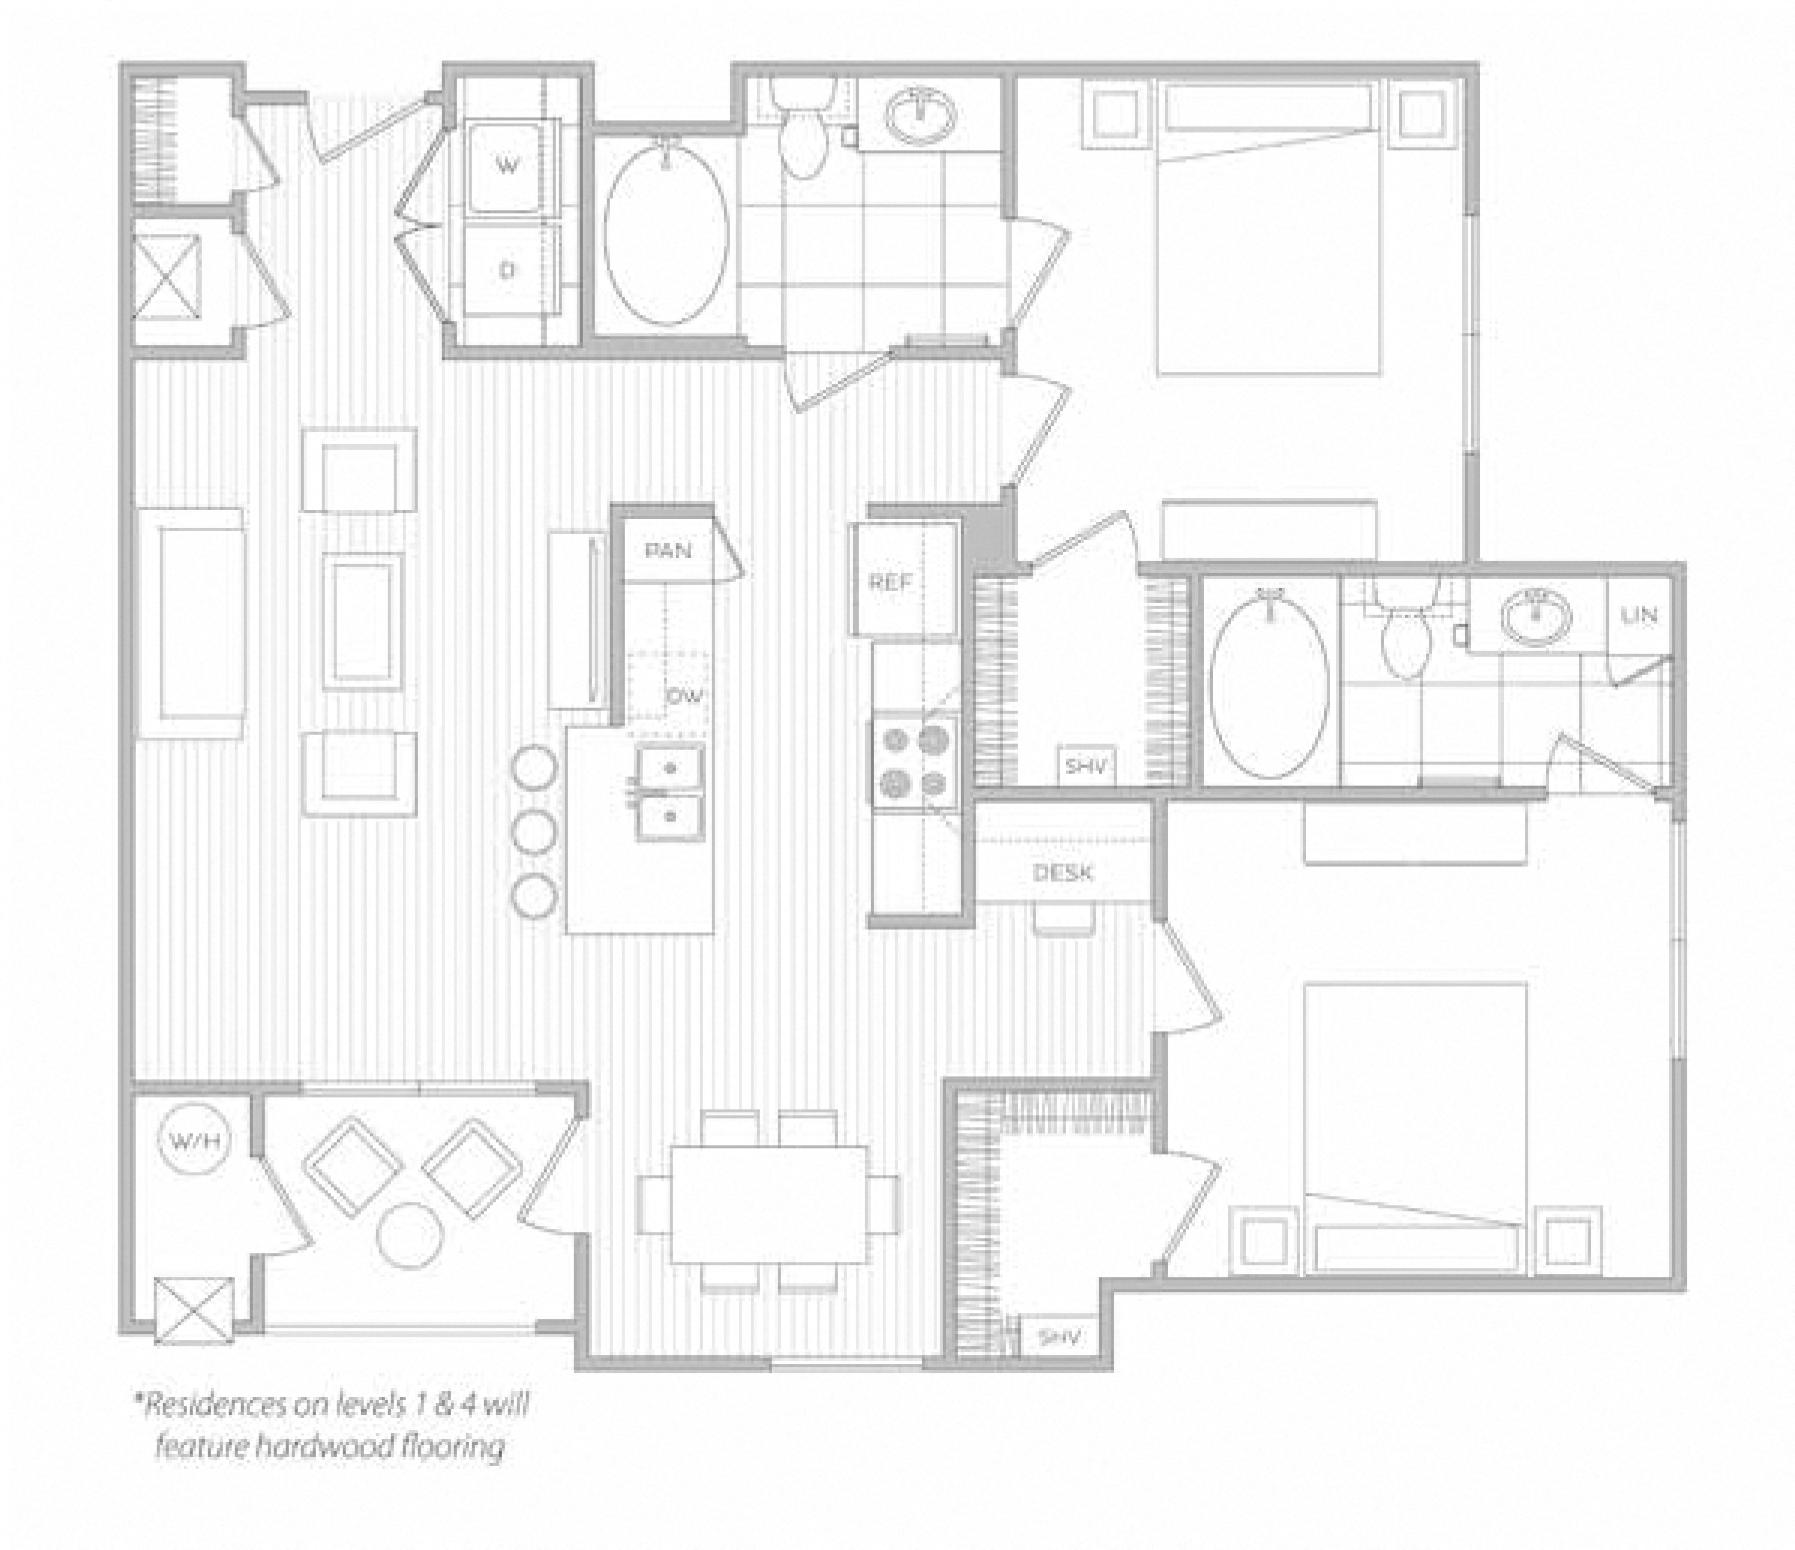 floor plan image of apartment 3201